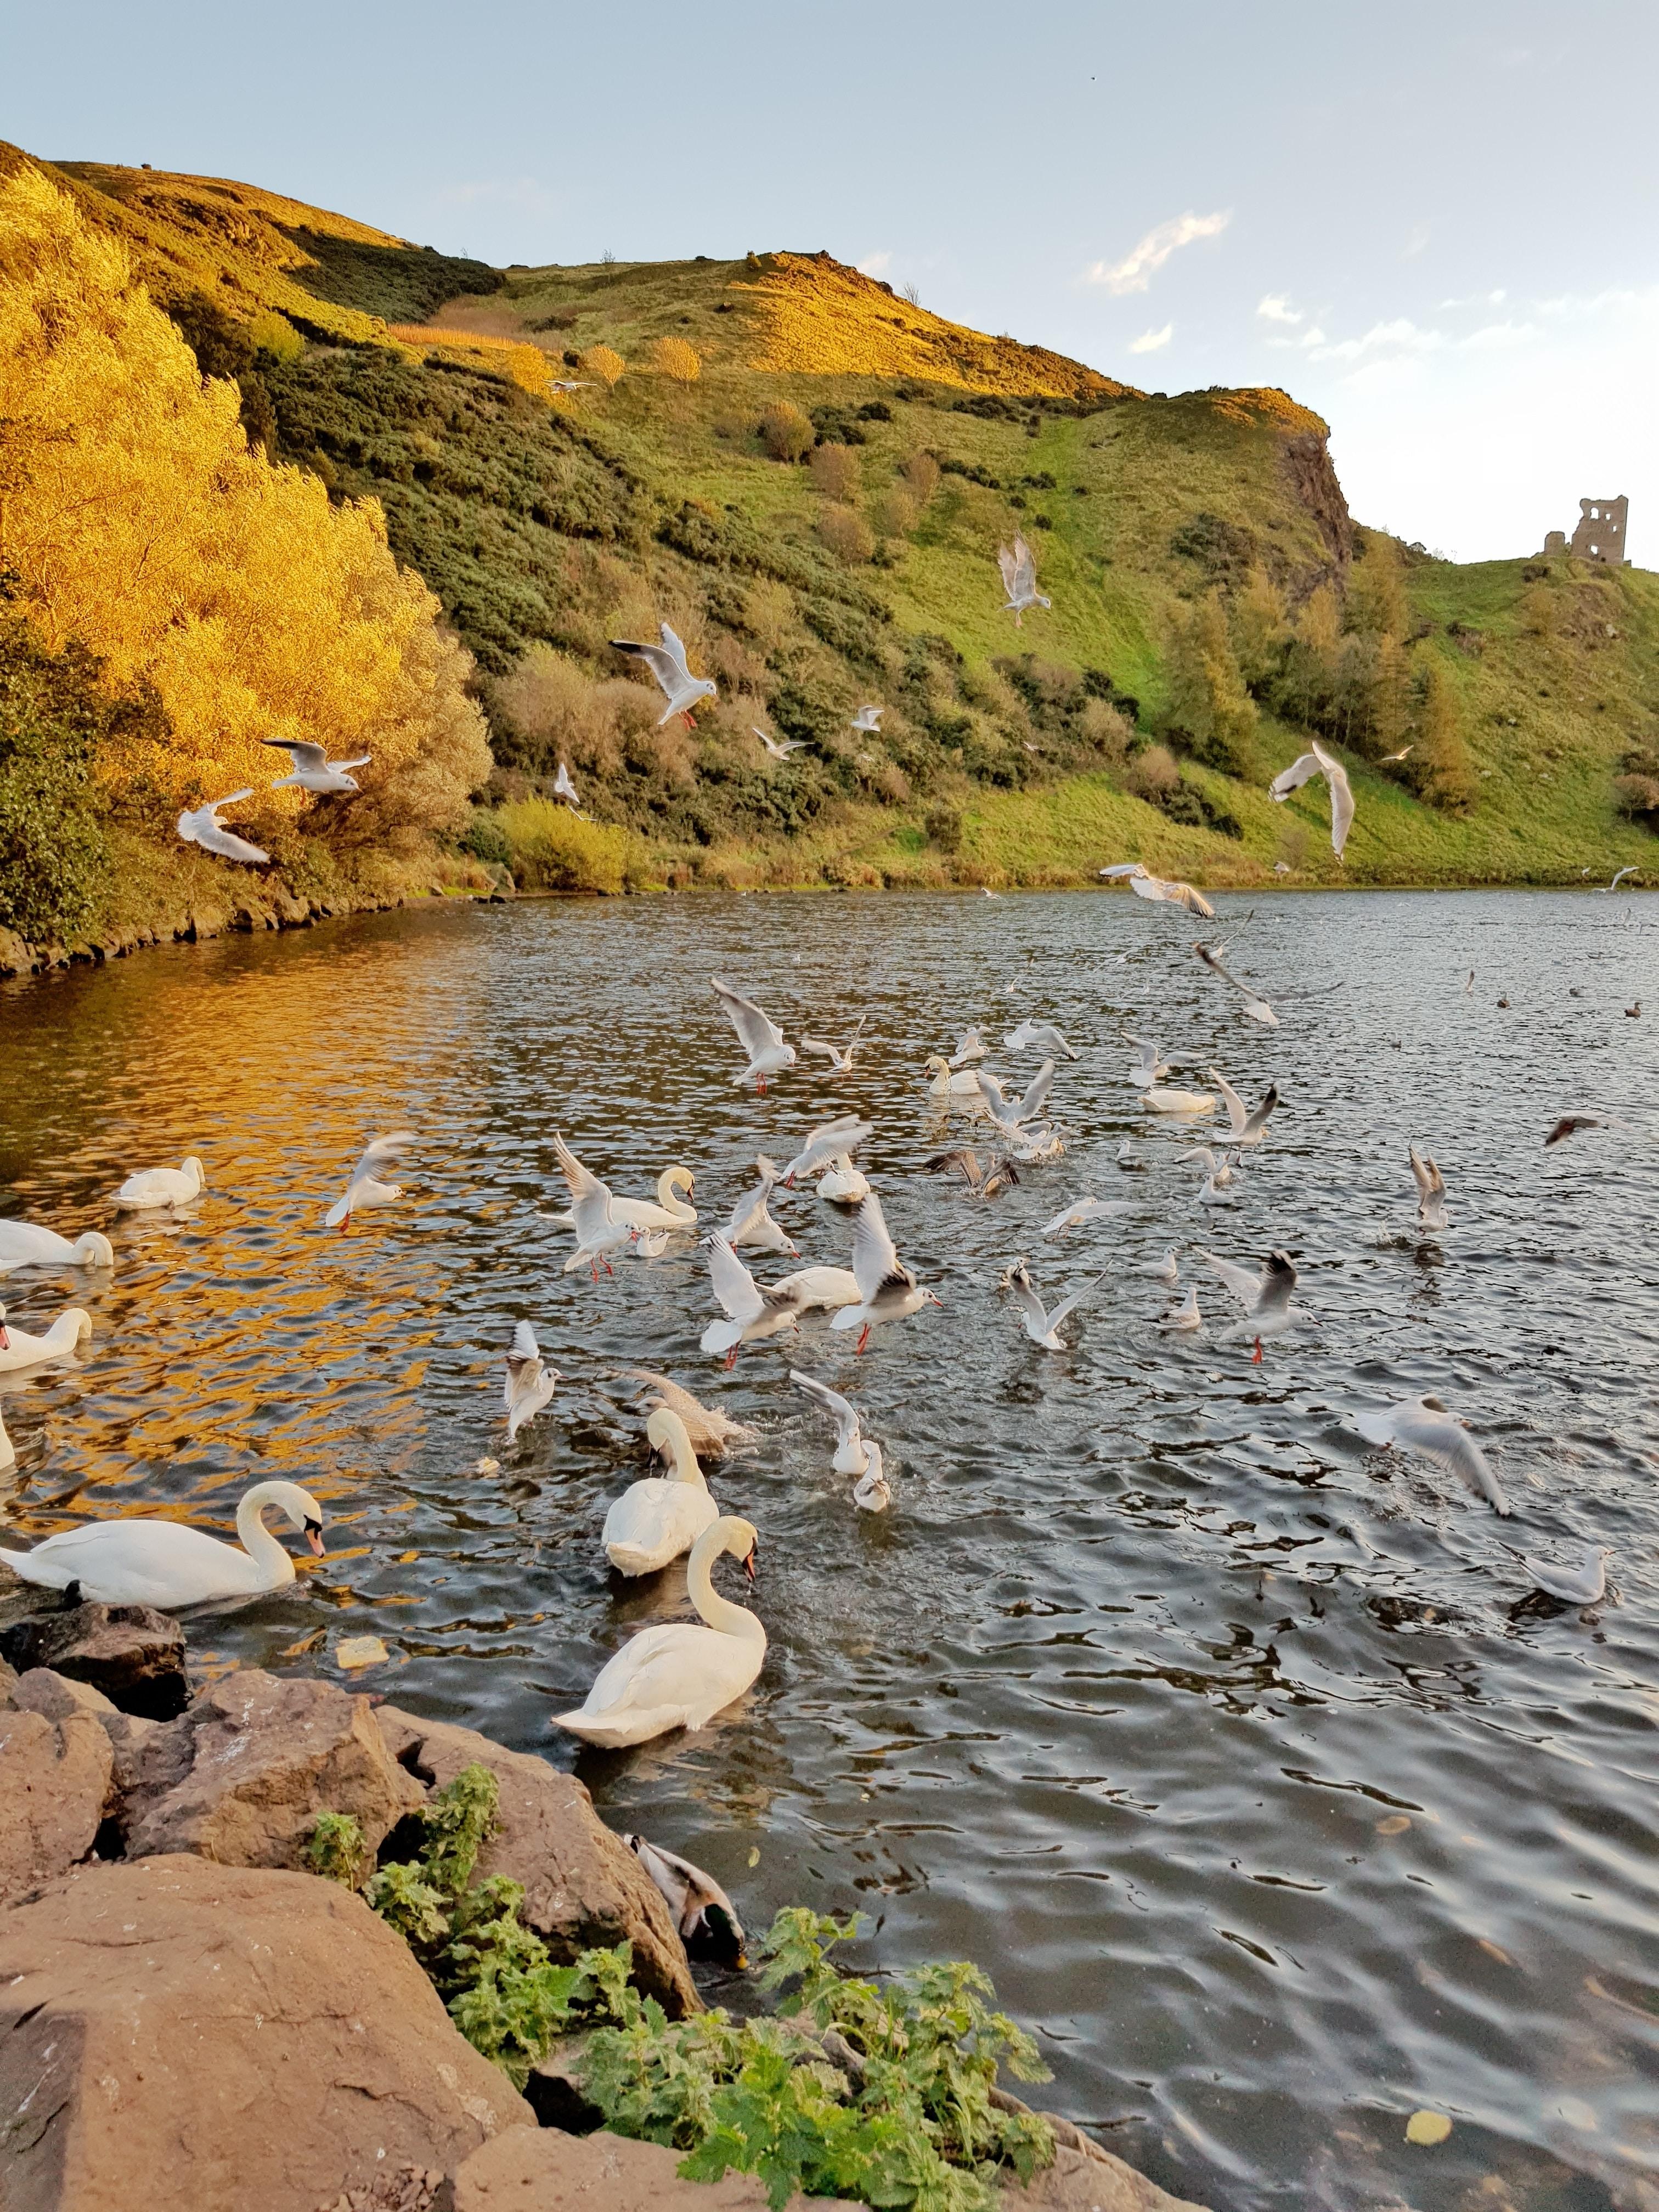 flock of swan on lake